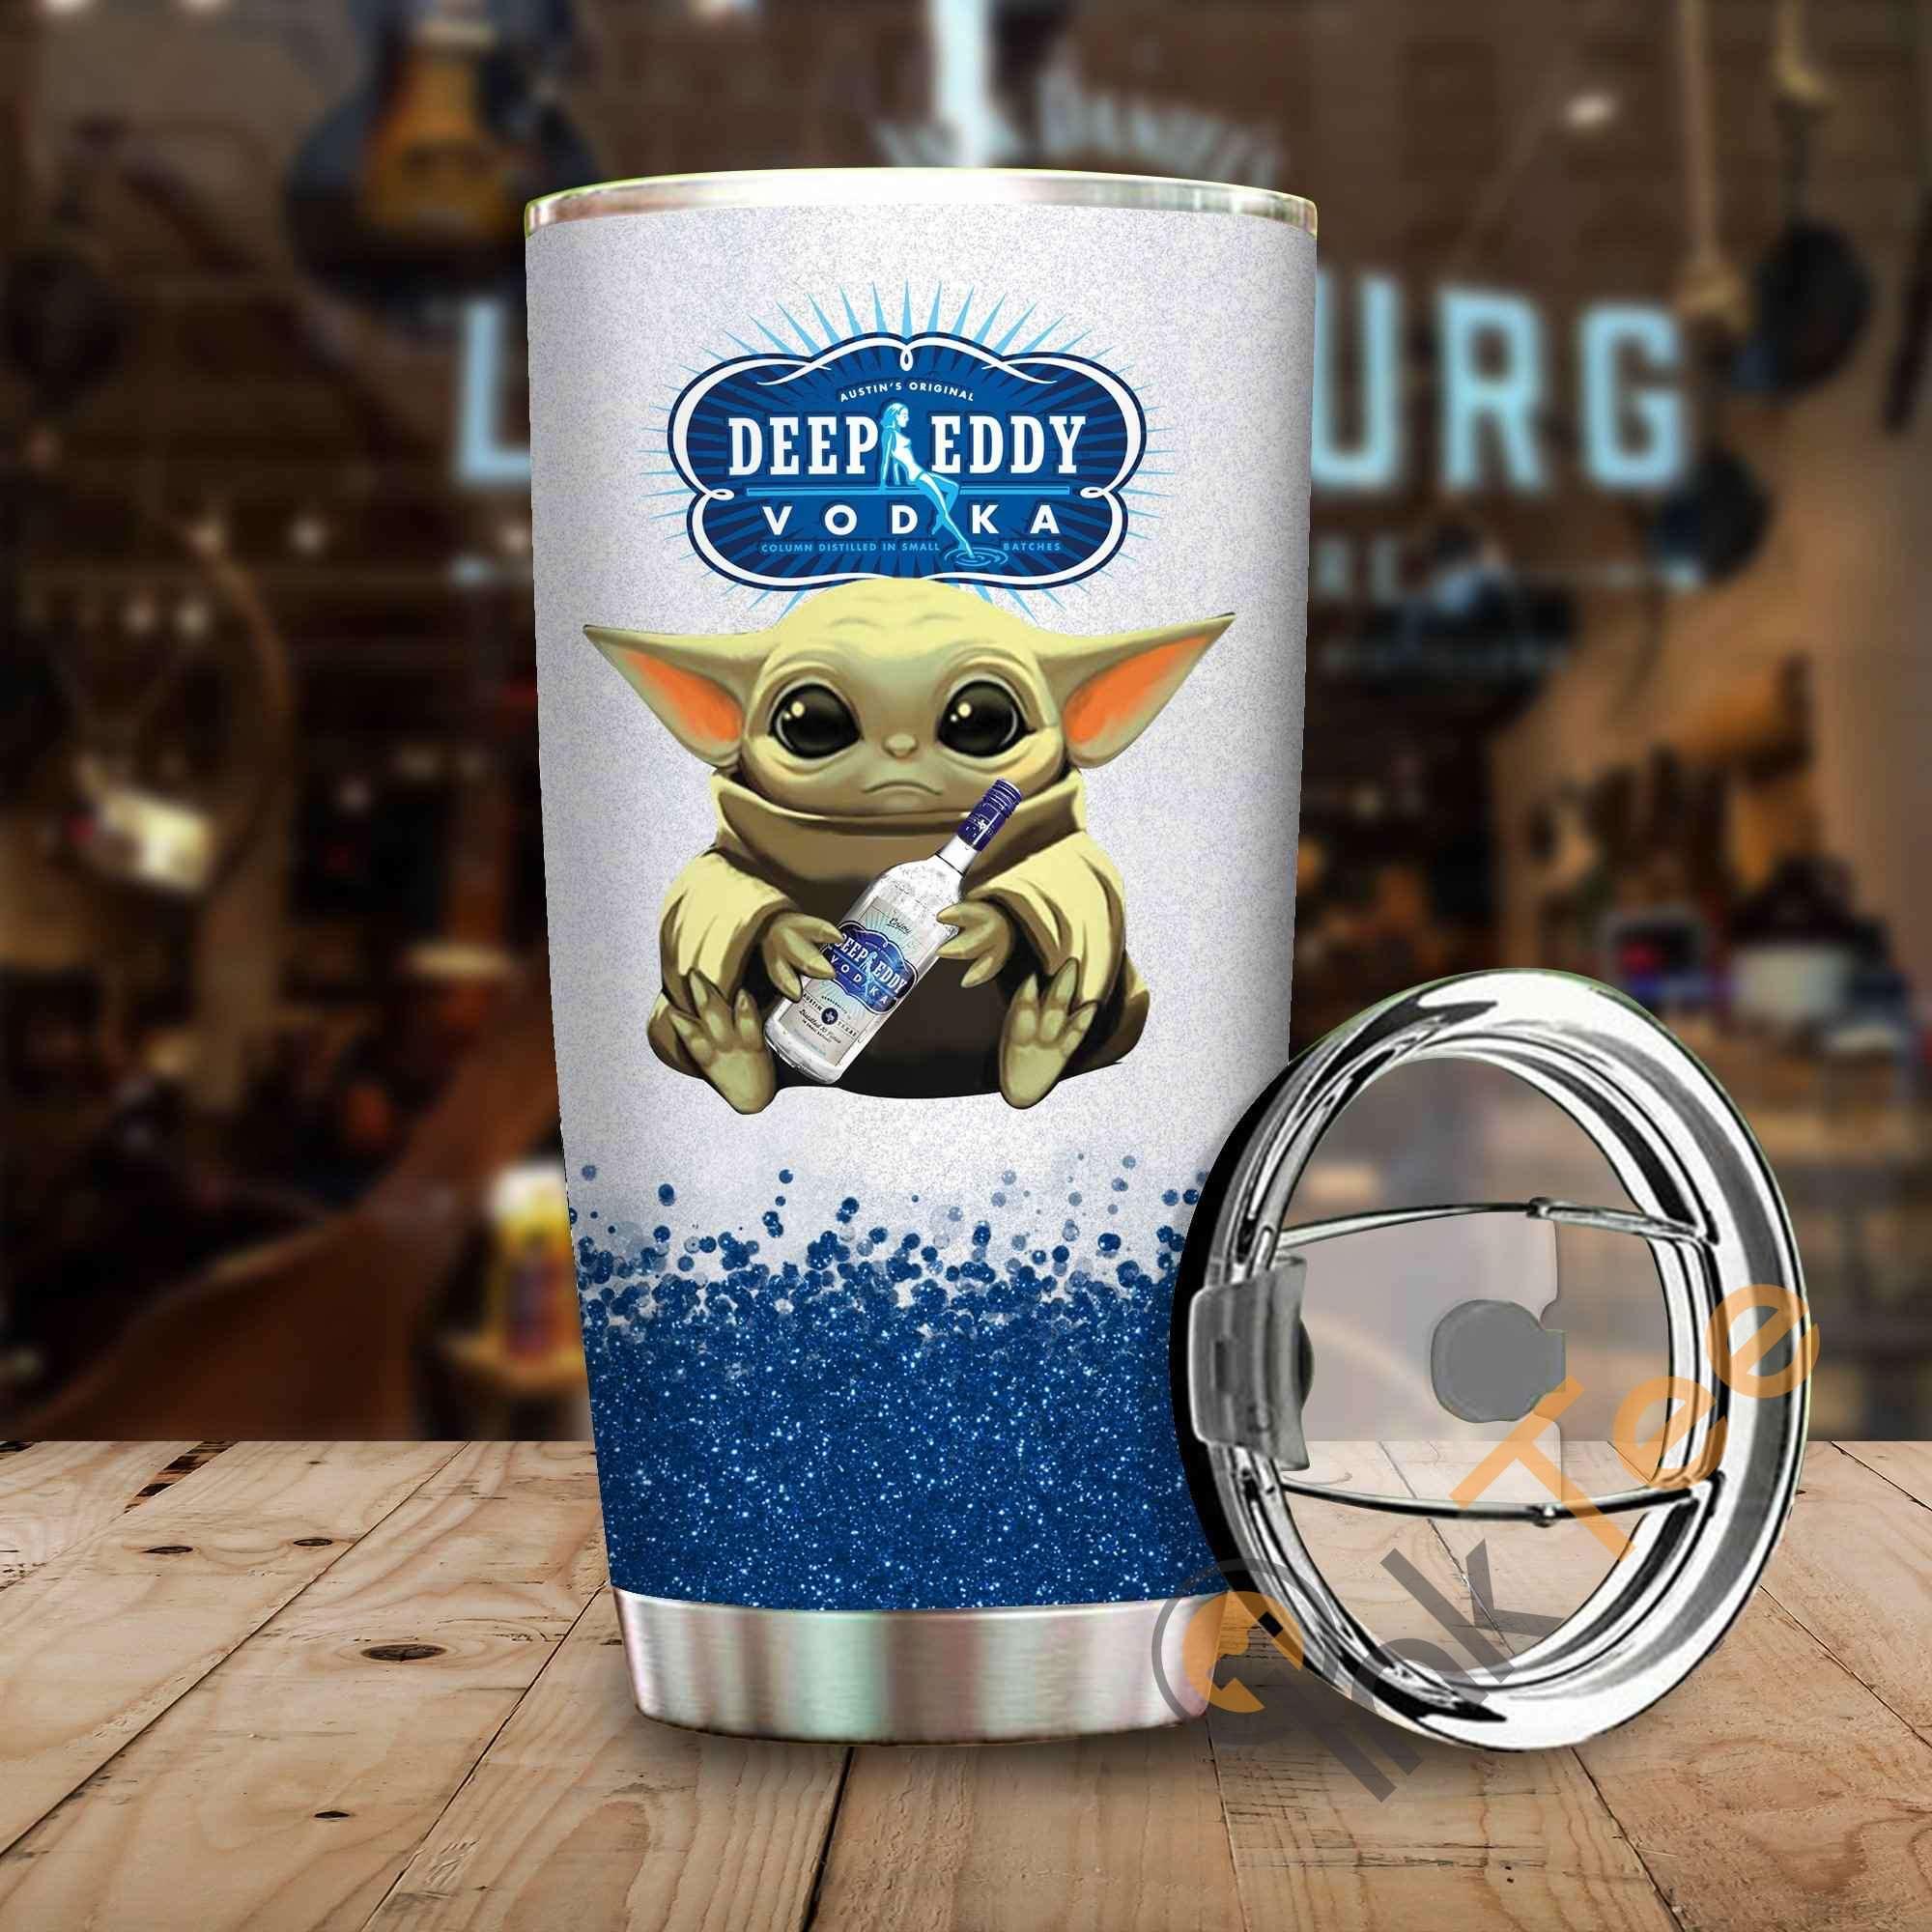 Baby Yoda Hold Deep Eddy Vodka Wine Bottle Amazon Best Seller Sku 3905 Stainless Steel Tumbler